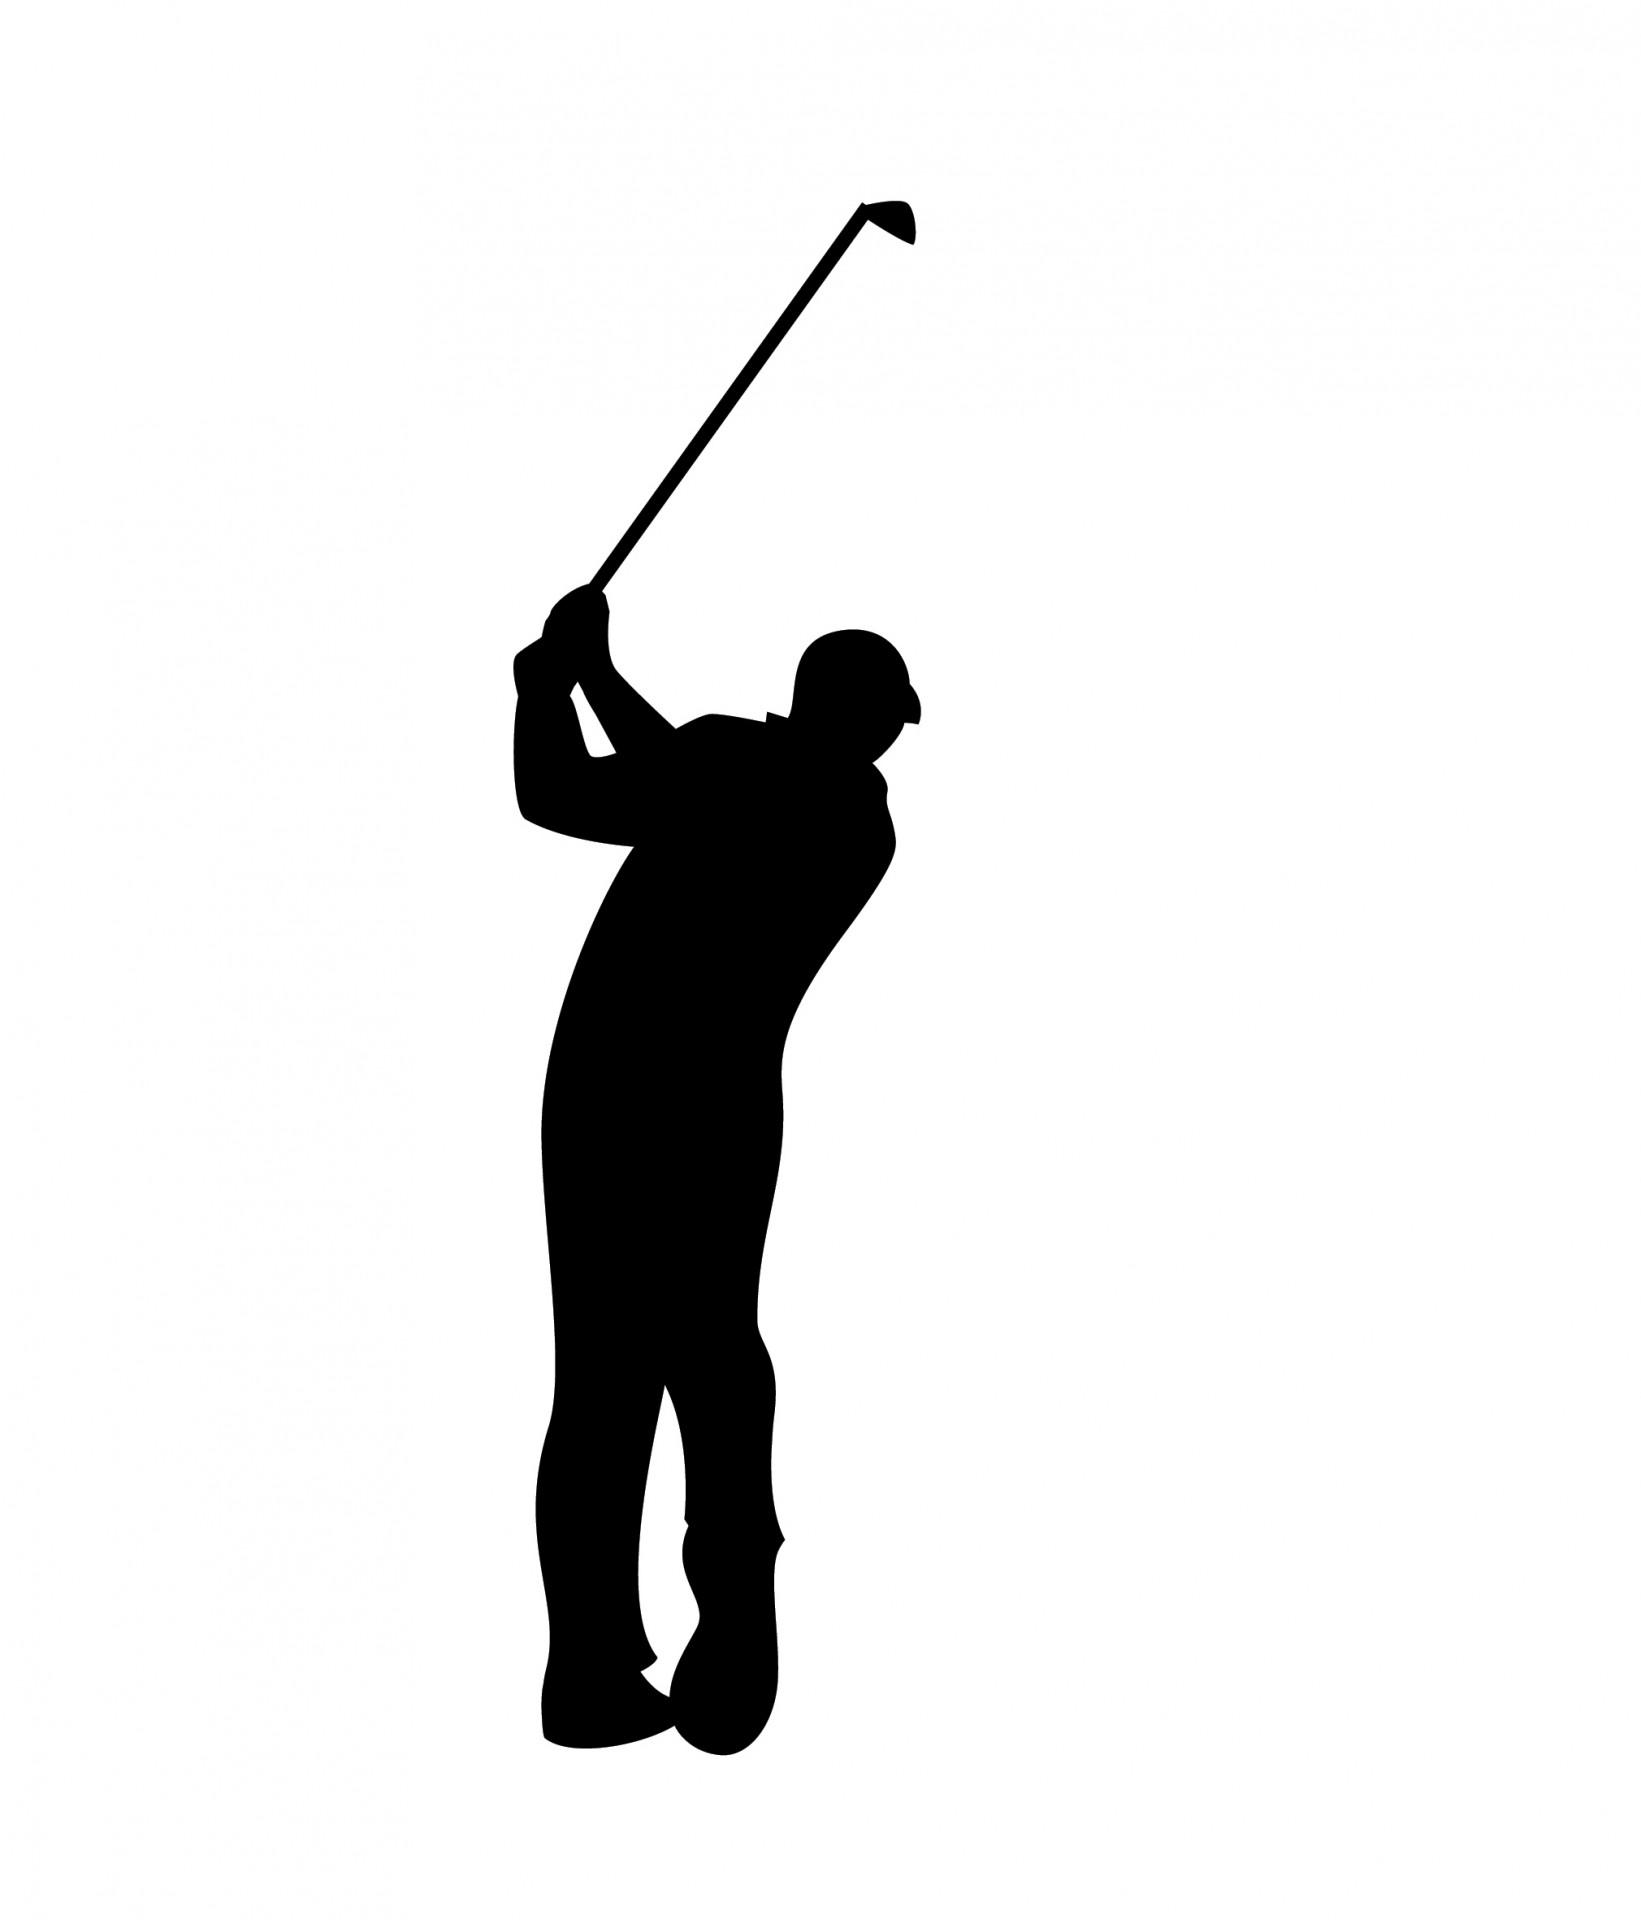 1641x1920 Golfer Black Silhouette Free Stock Photo